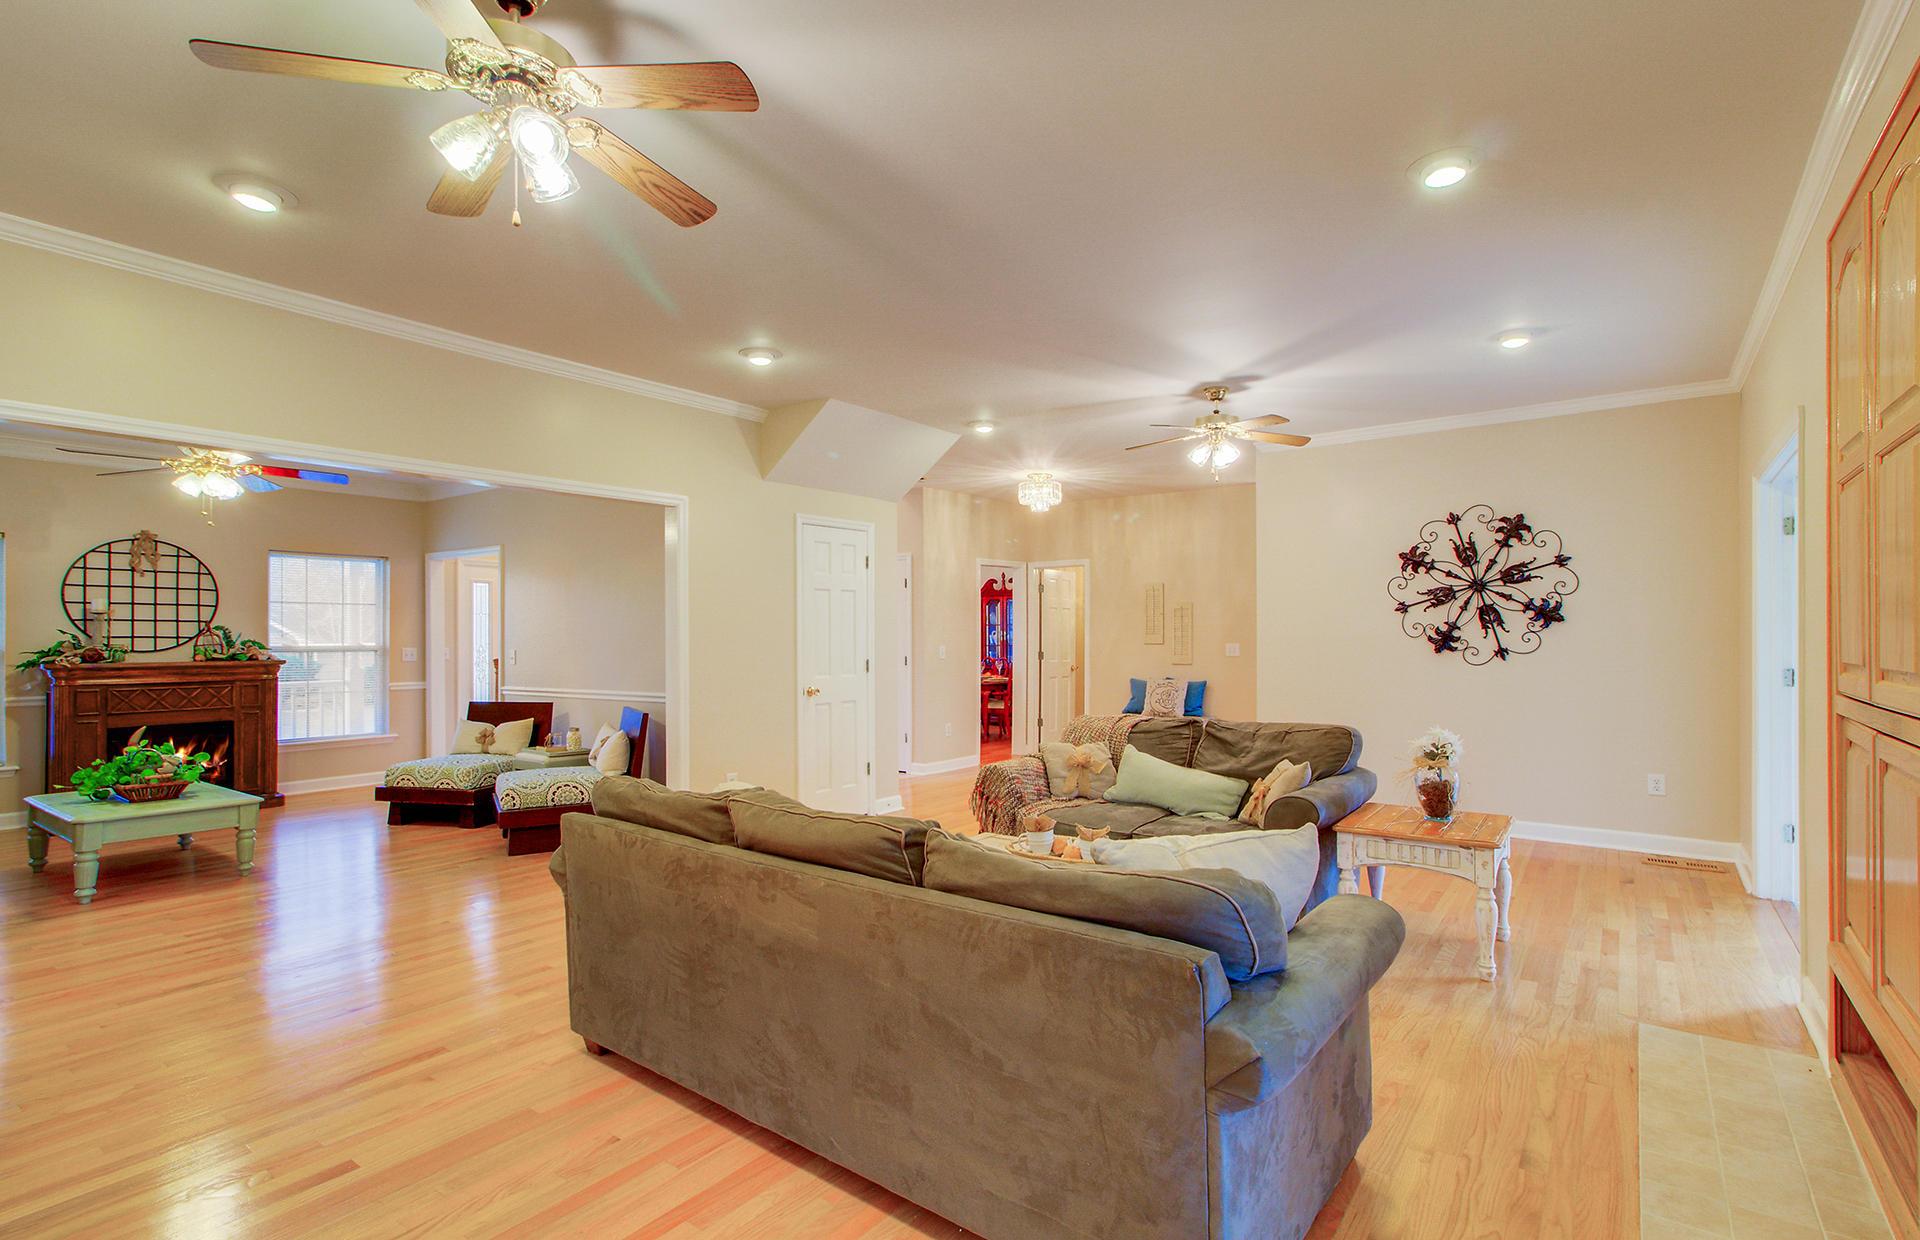 Bakers Landing Homes For Sale - 105 River Oak, North Charleston, SC - 26